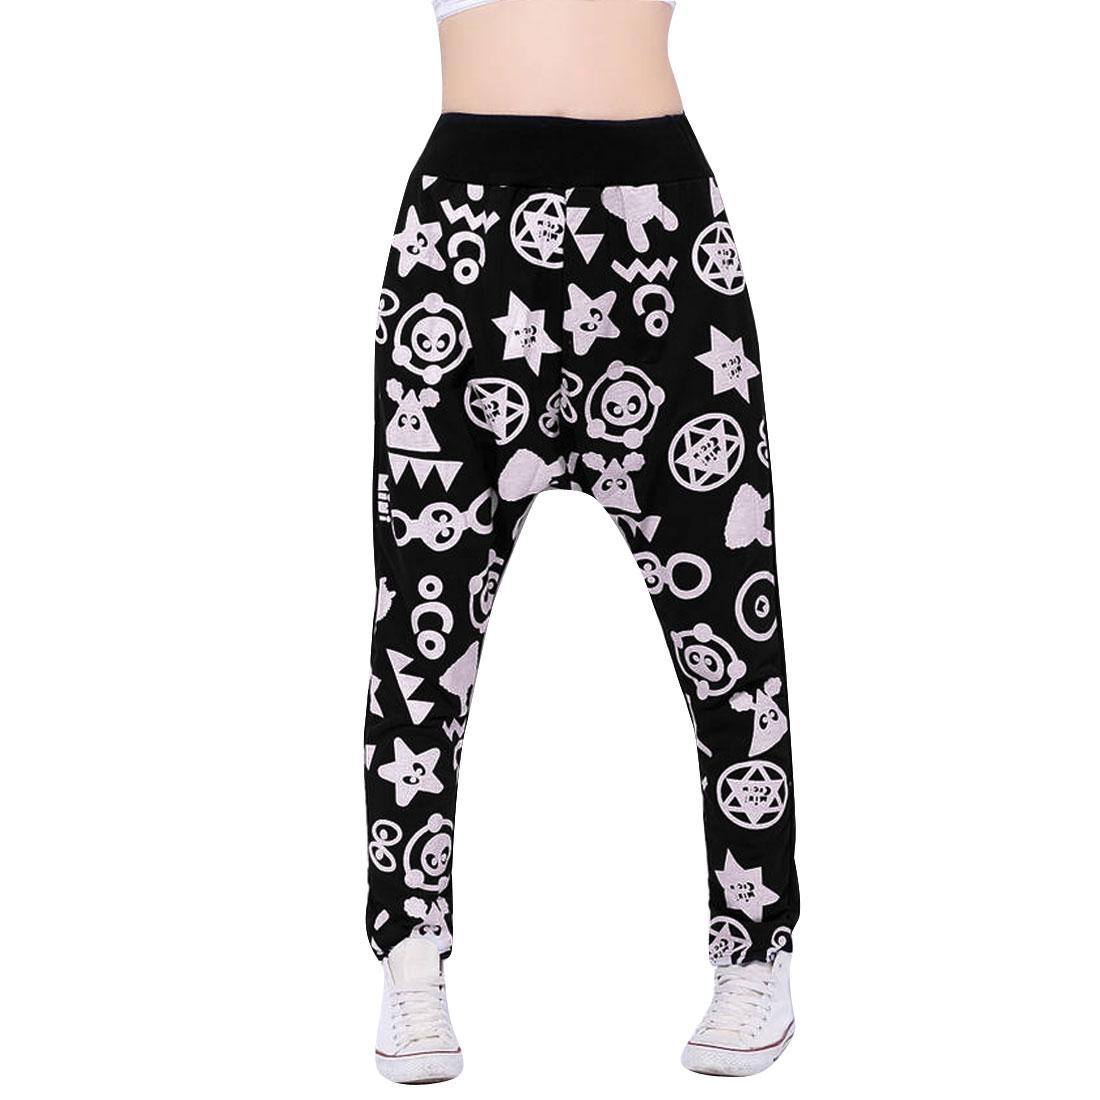 Women Black S Elastic Waist Style Cartoon Pattern Fashion Capris Harem Pants